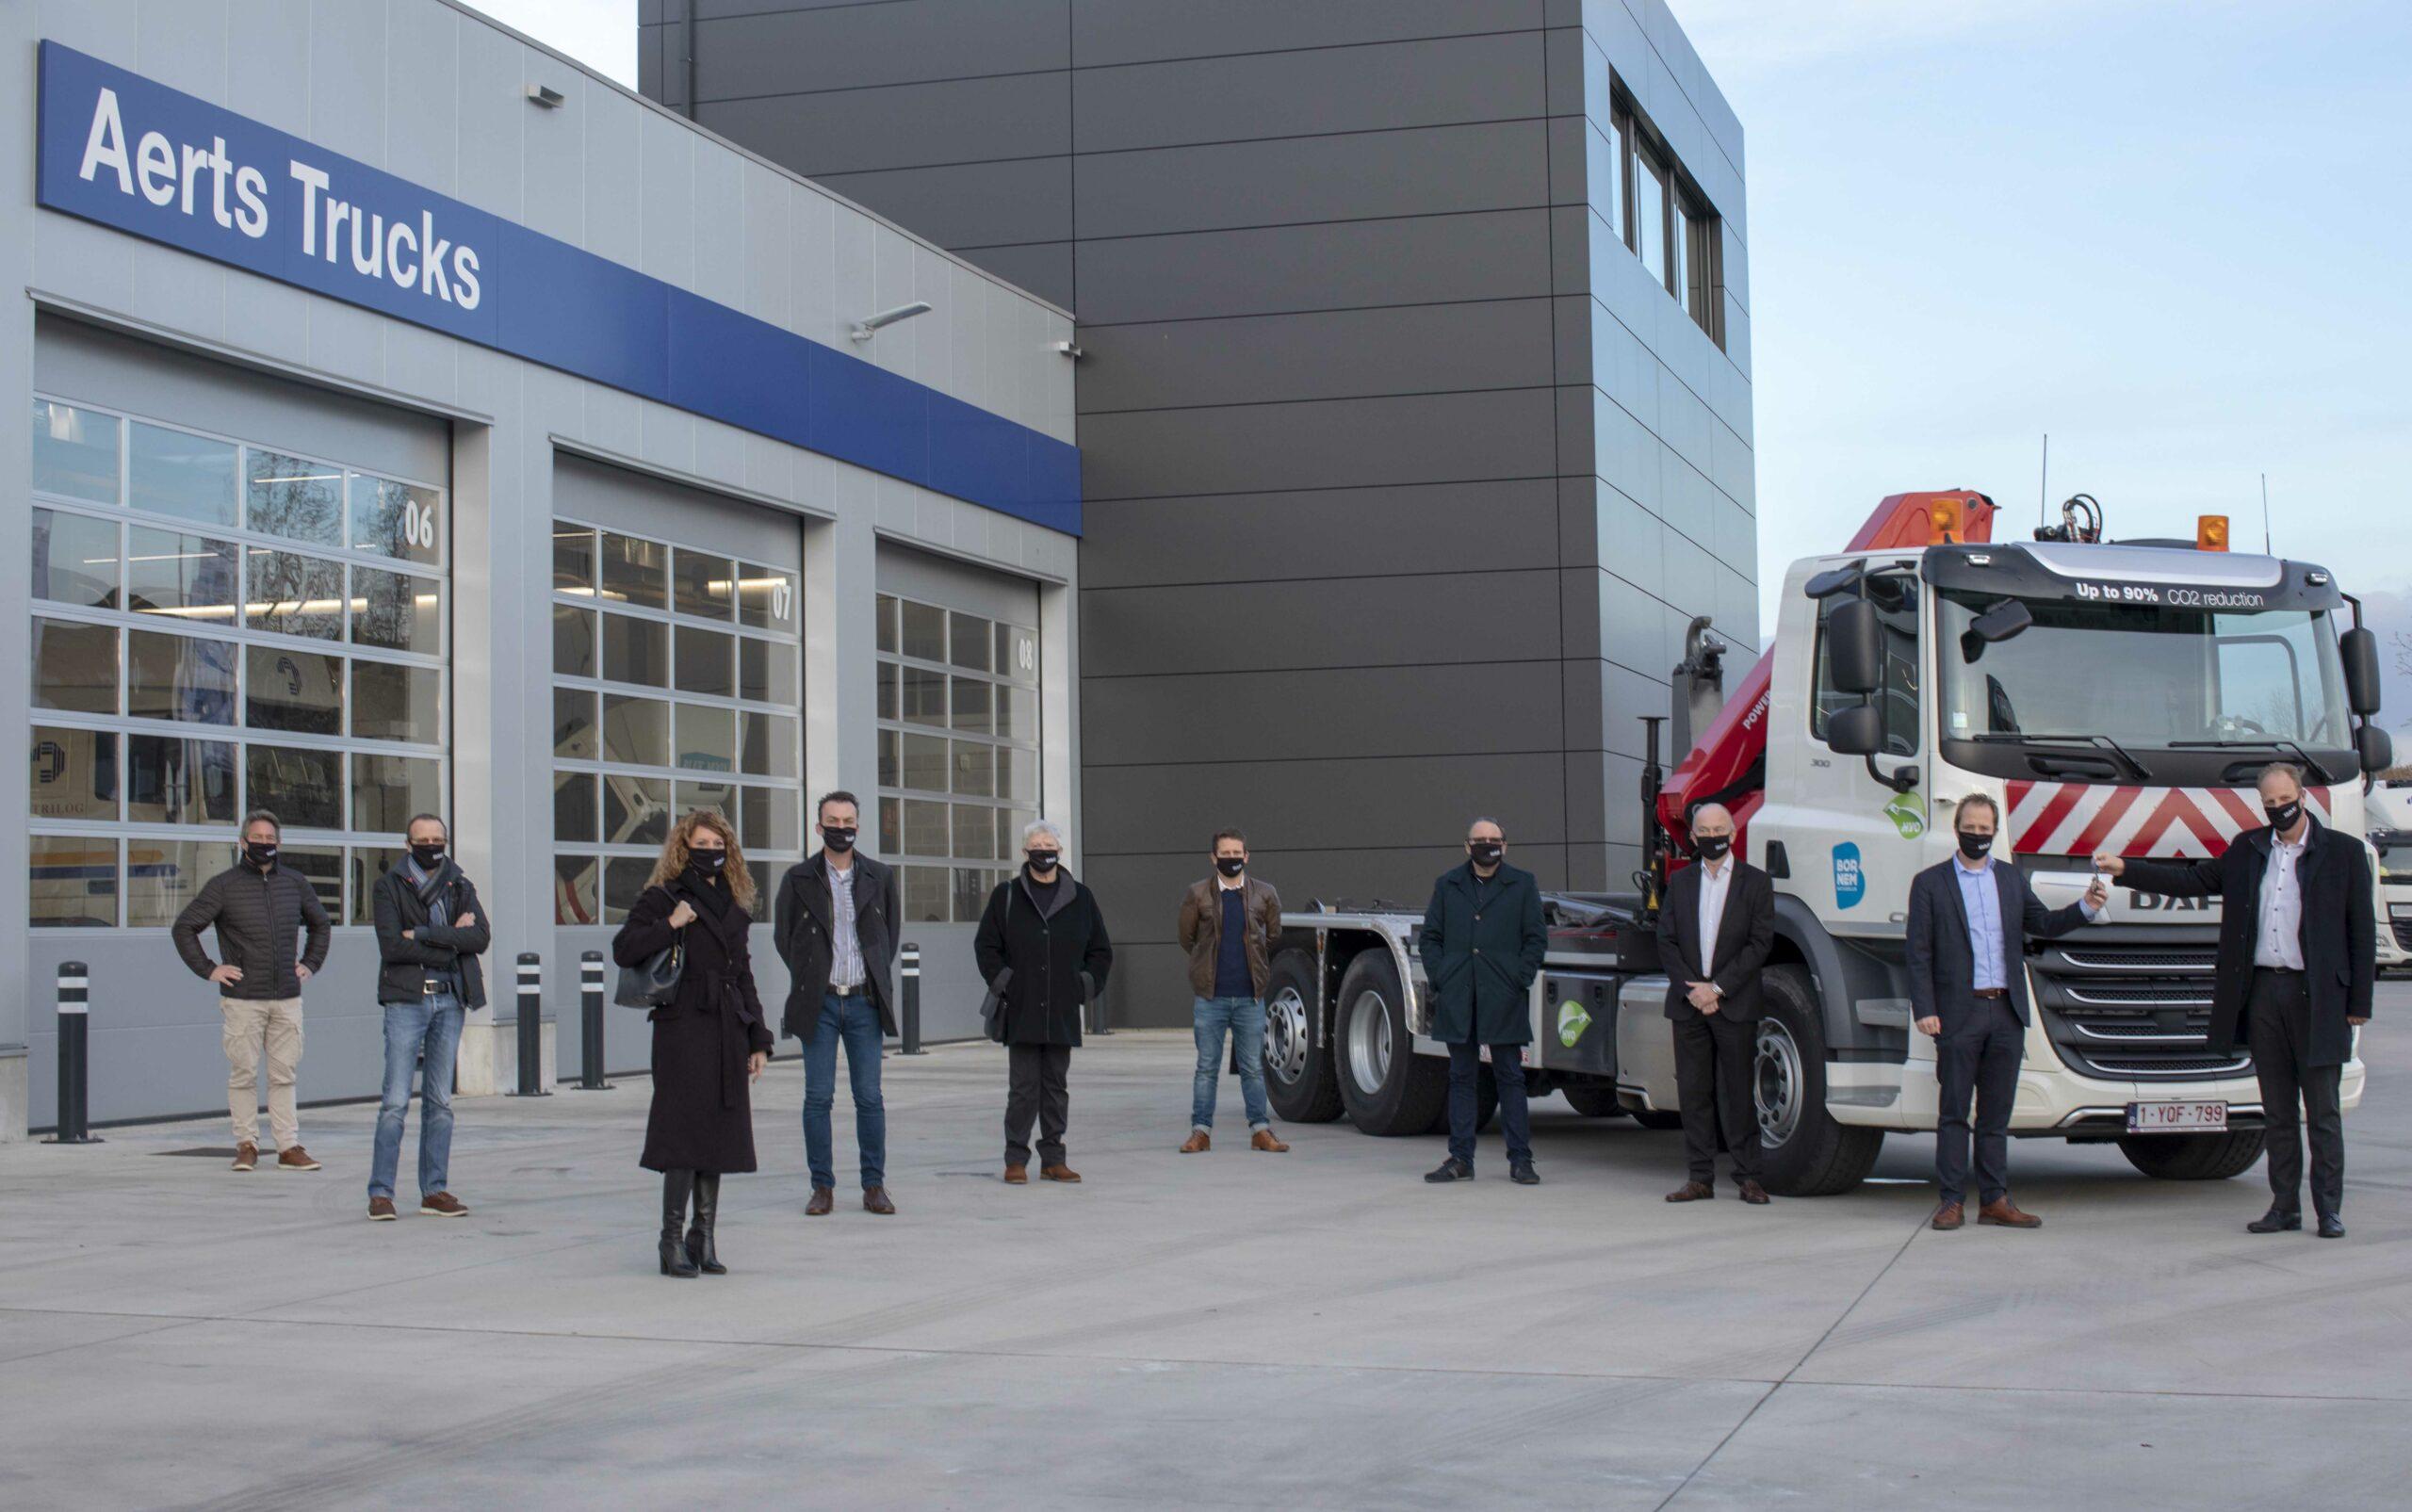 Gemeente Bornem en Aerts Trucks maken de cirkel rond